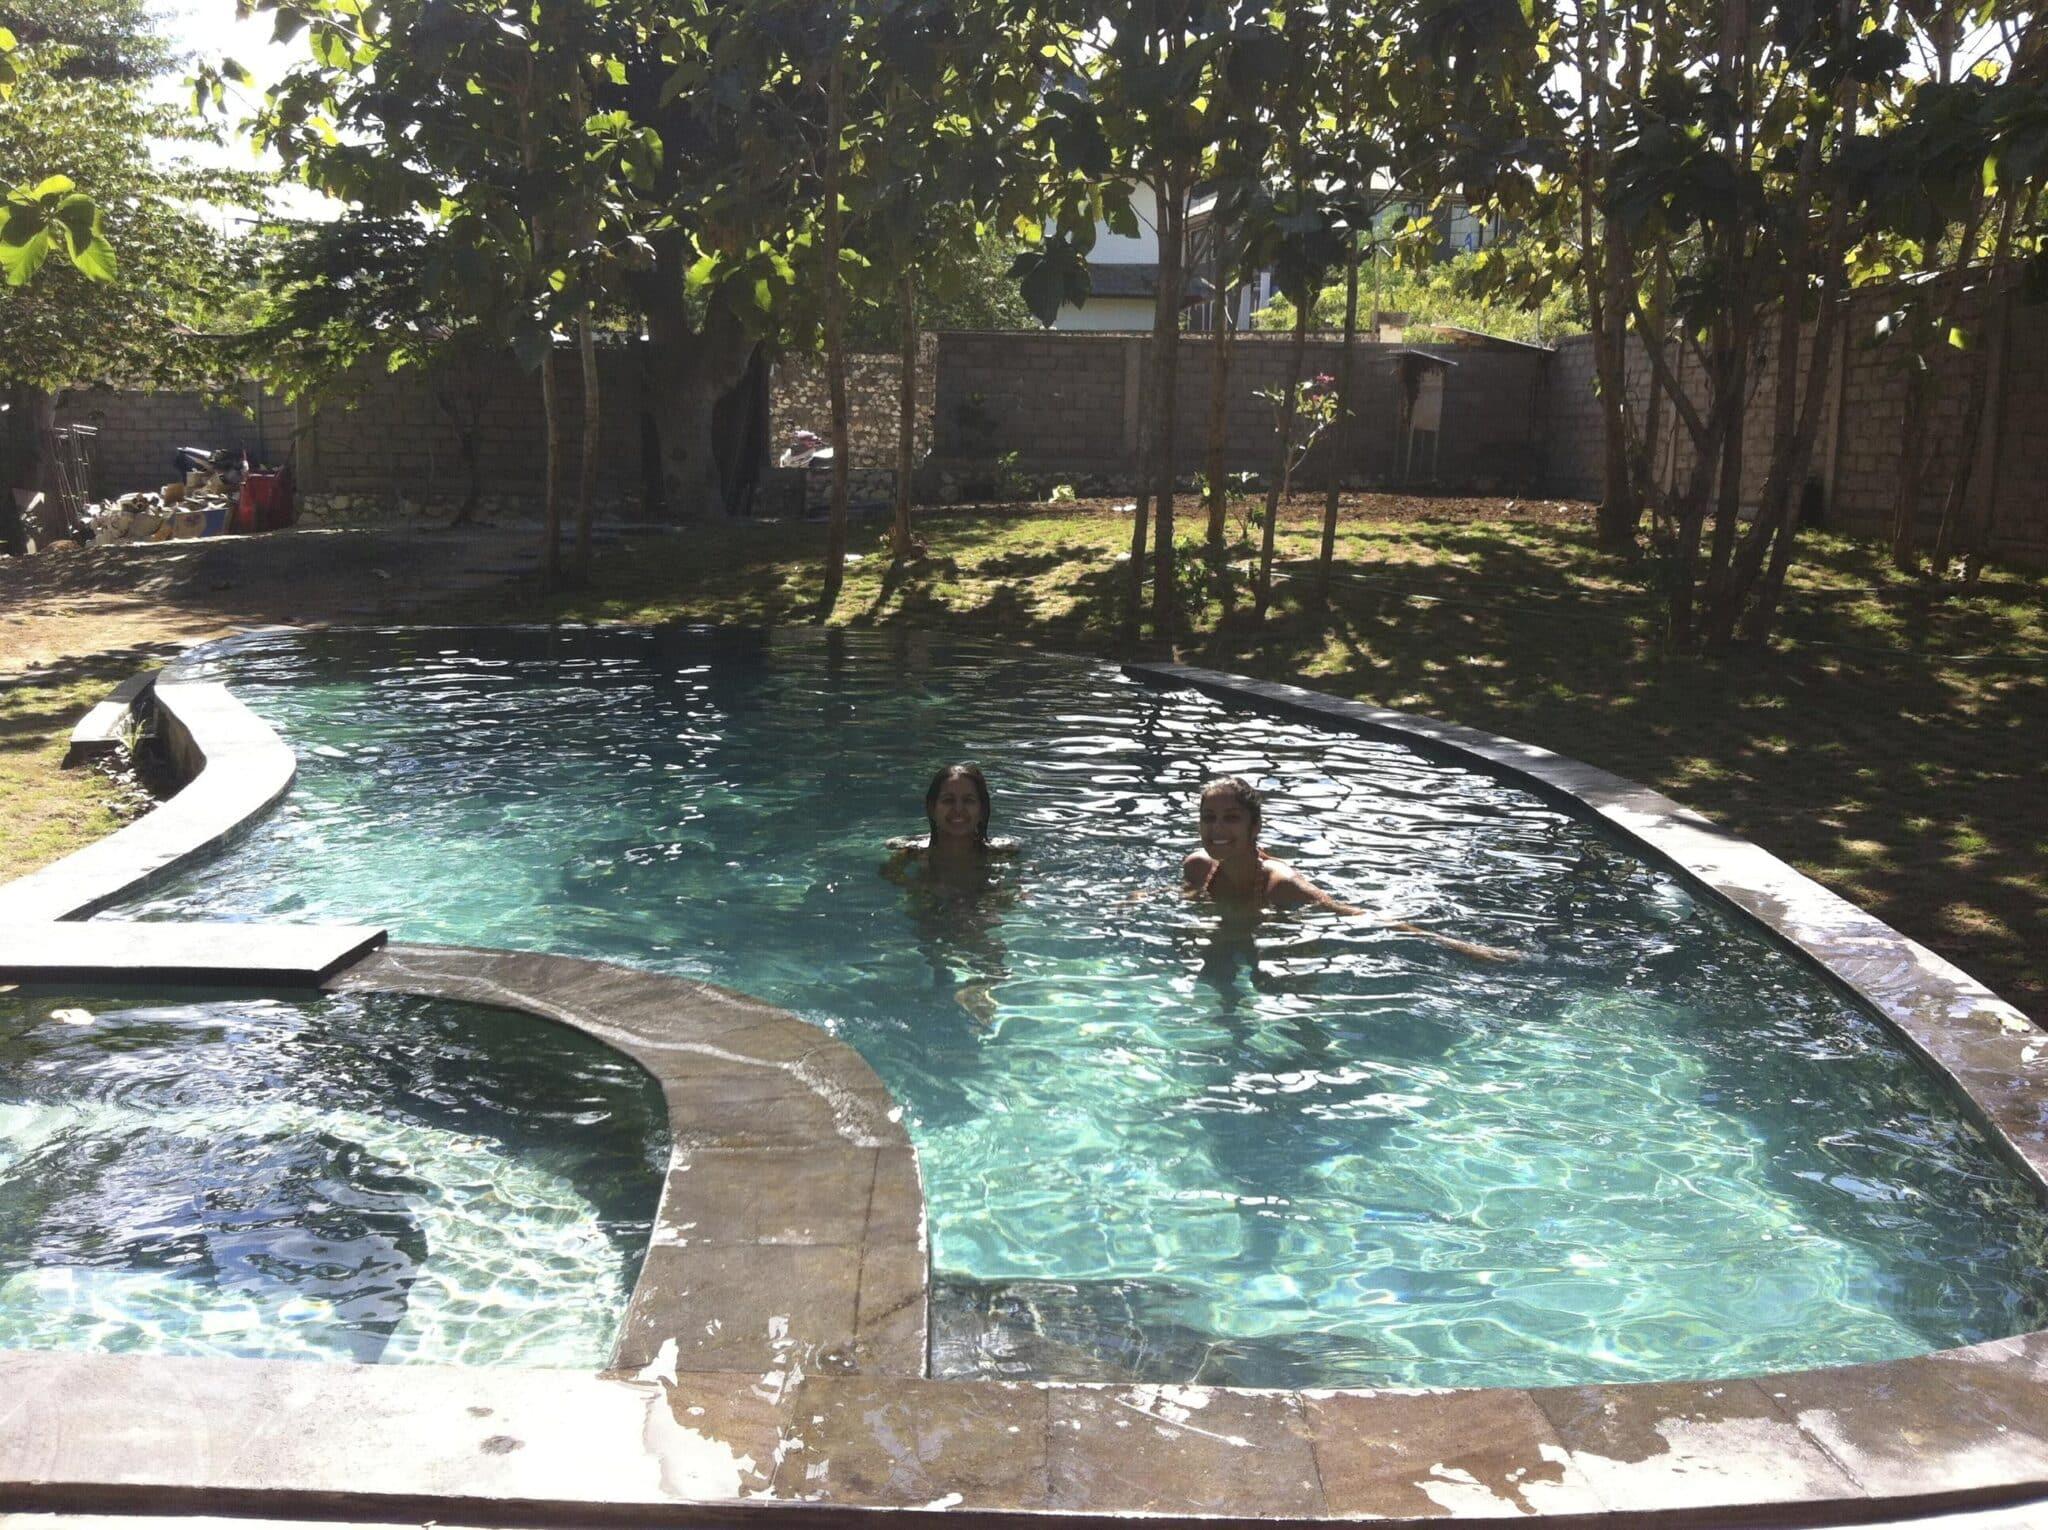 Hotel barato em Bali